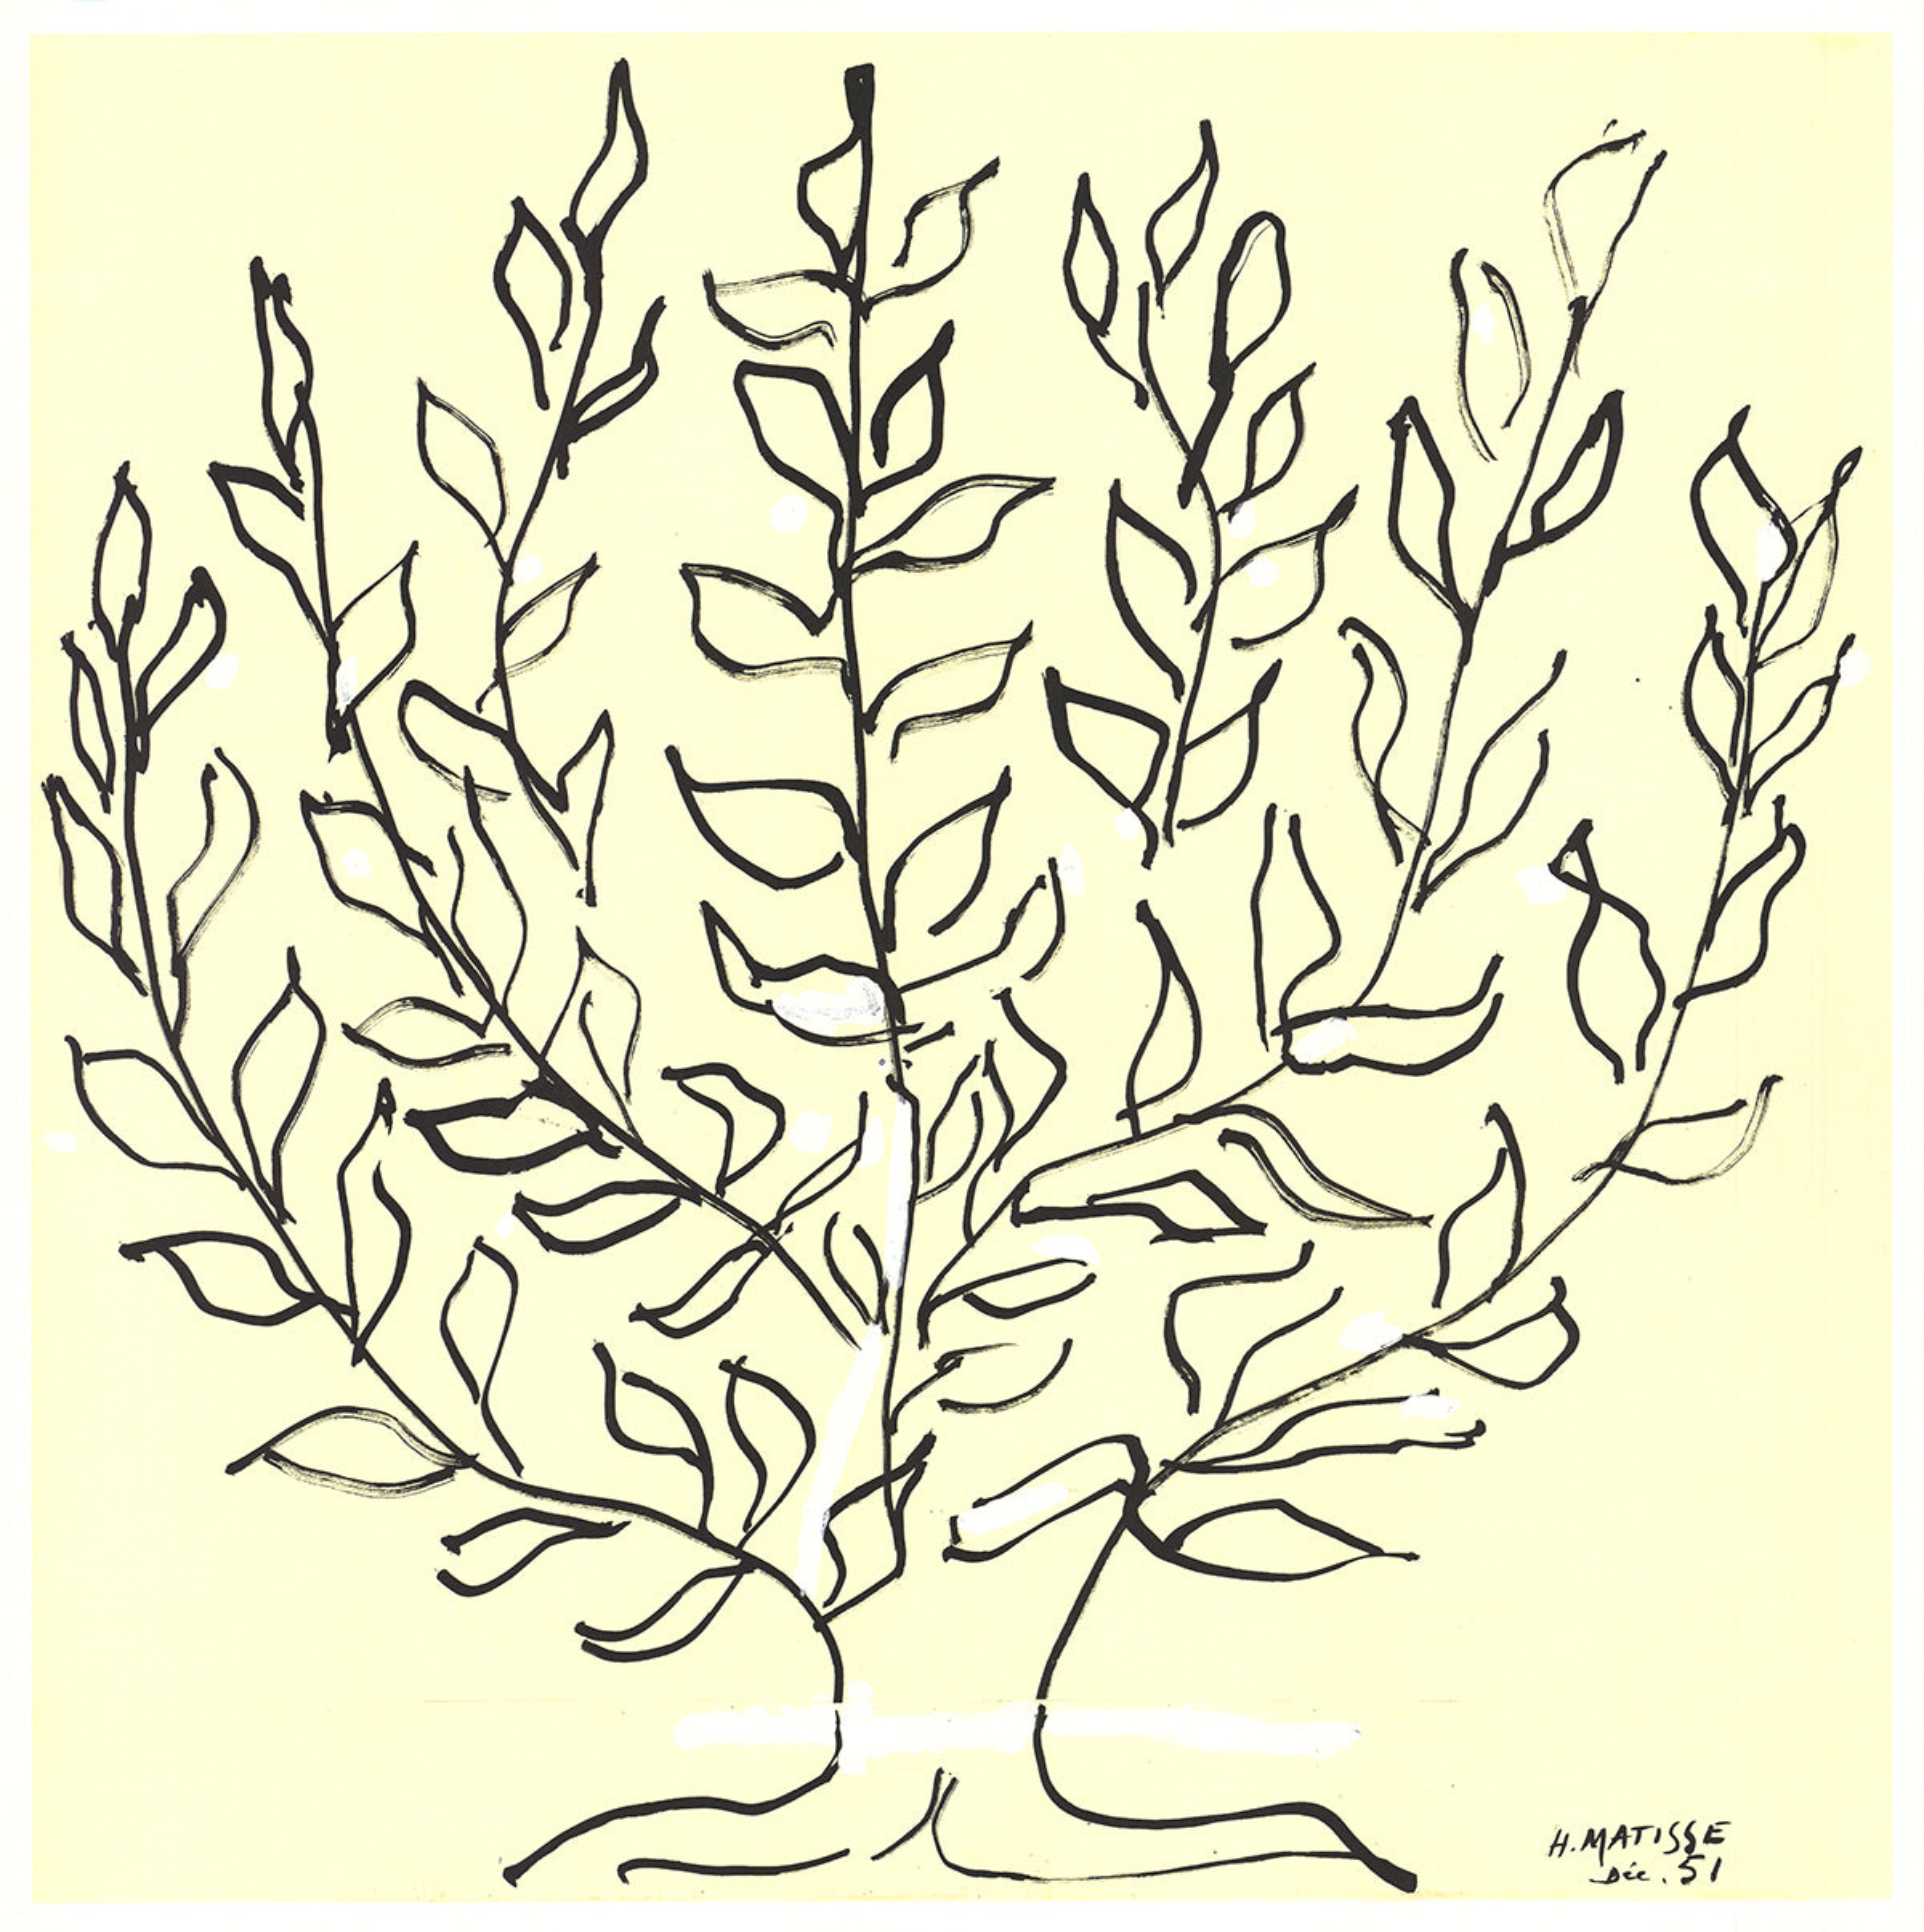 Henri Matisse-Le Buisson II-2015 Lithograph